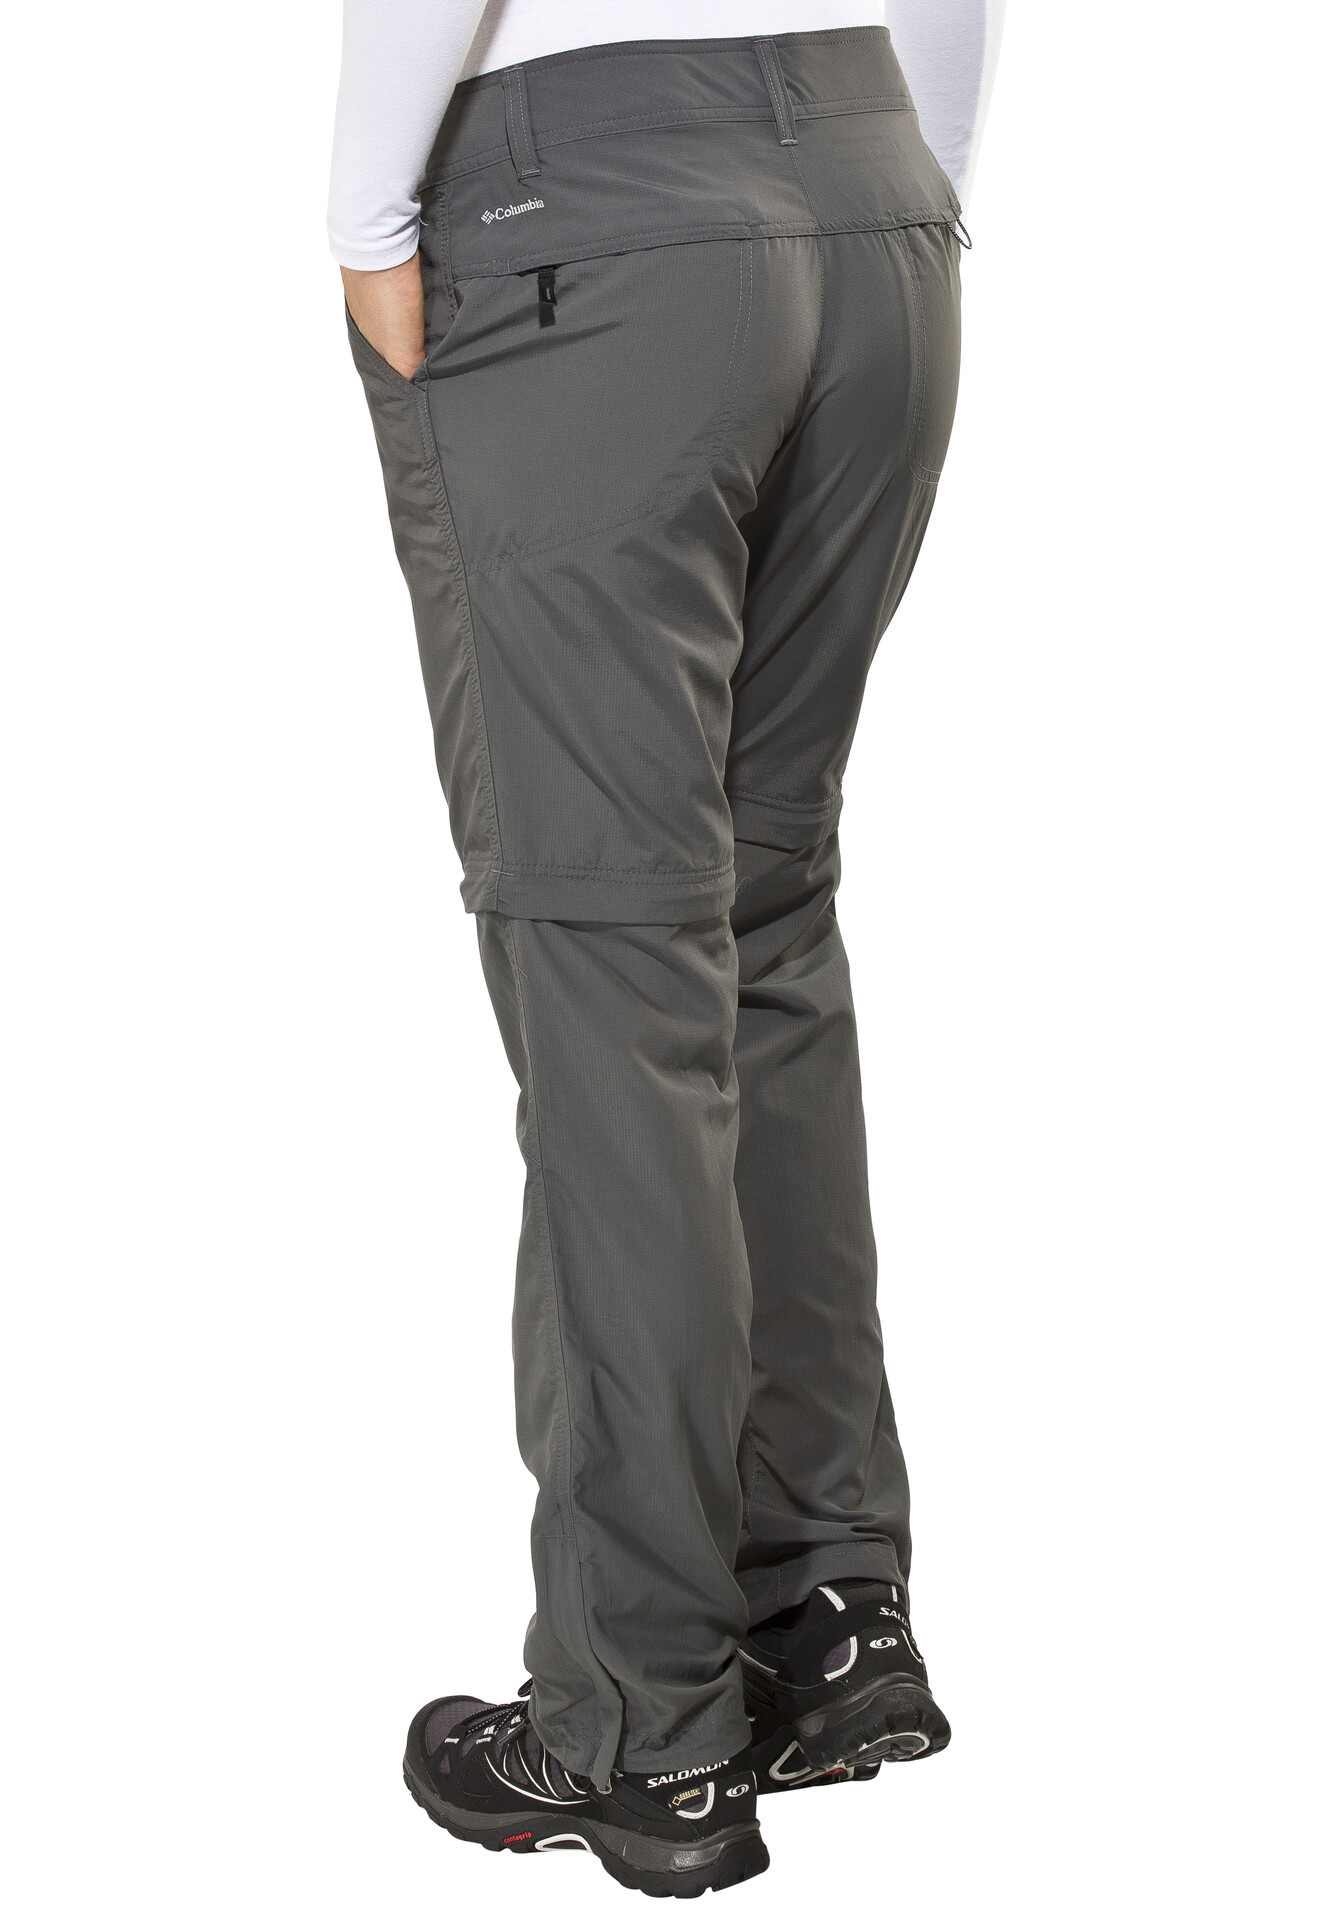 وزن تميز يمكن إدراكه Pantalon Trekking Columbia Natural Soap Directory Org